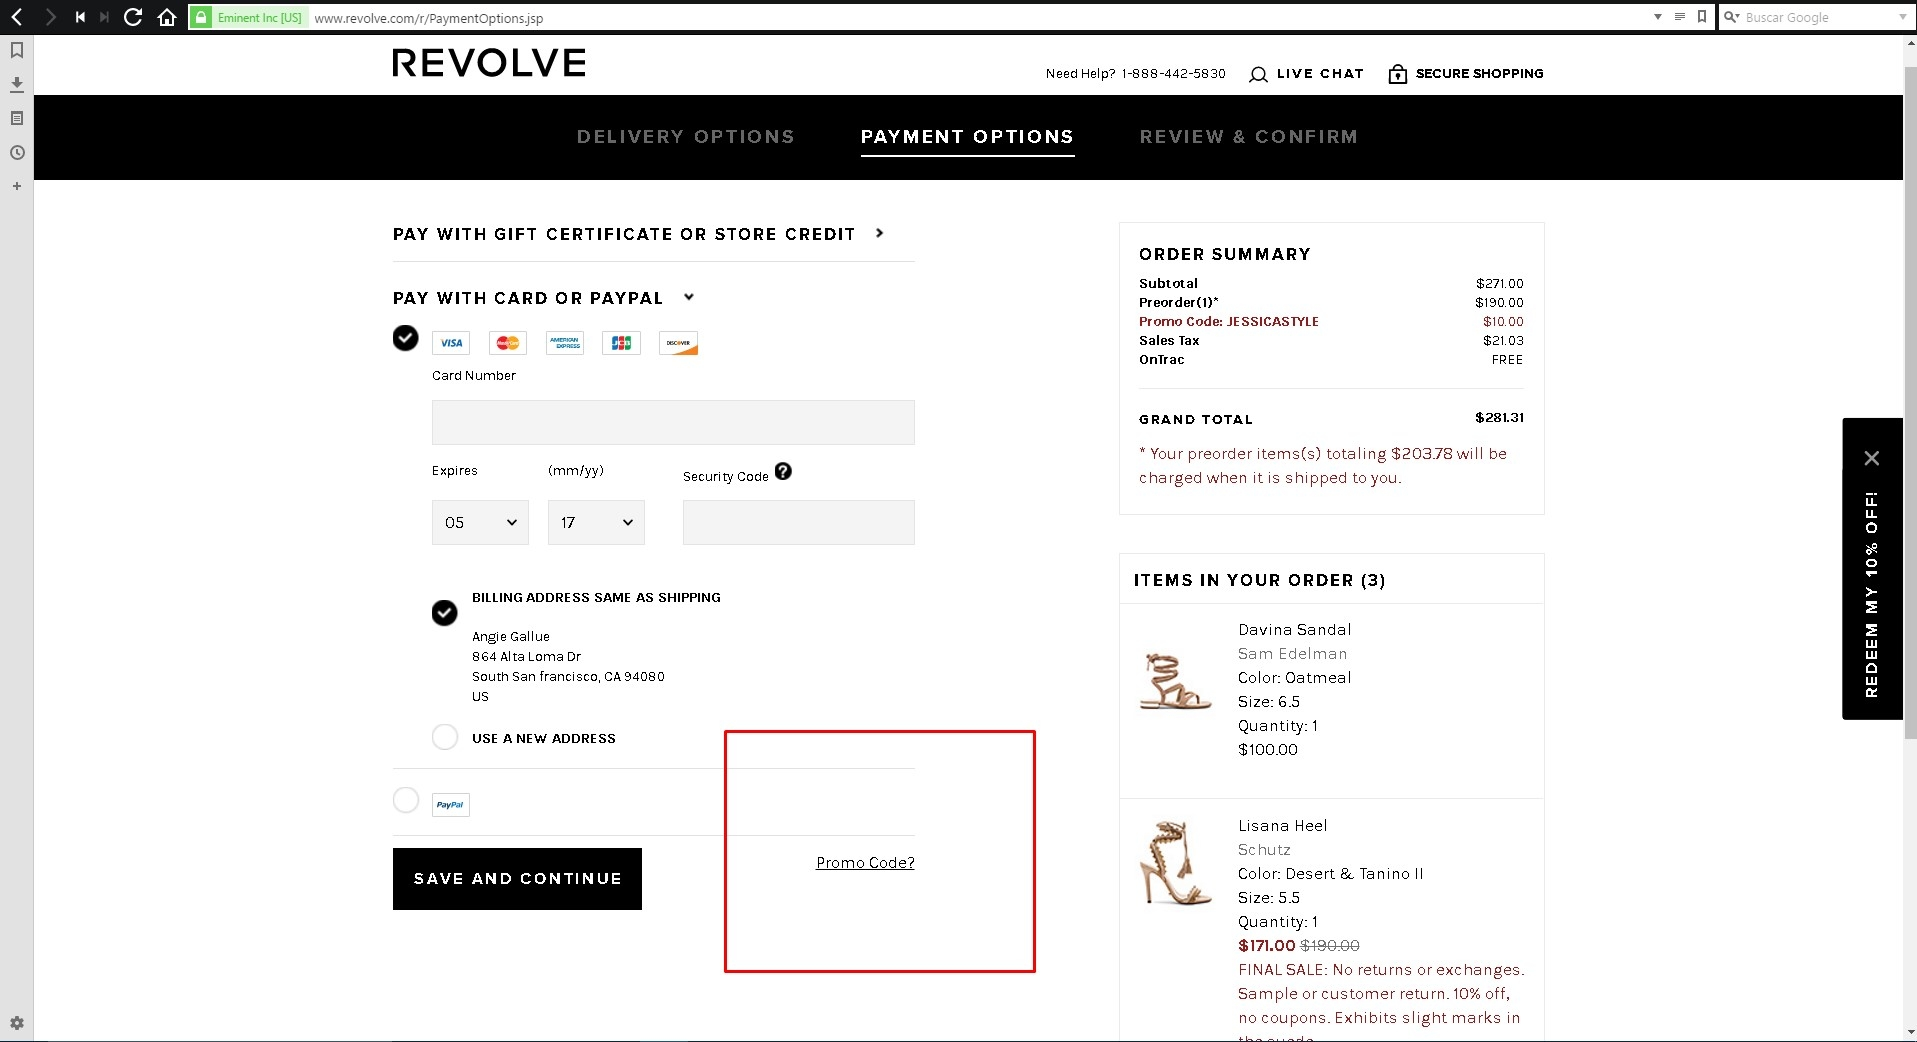 Revolve coupon code